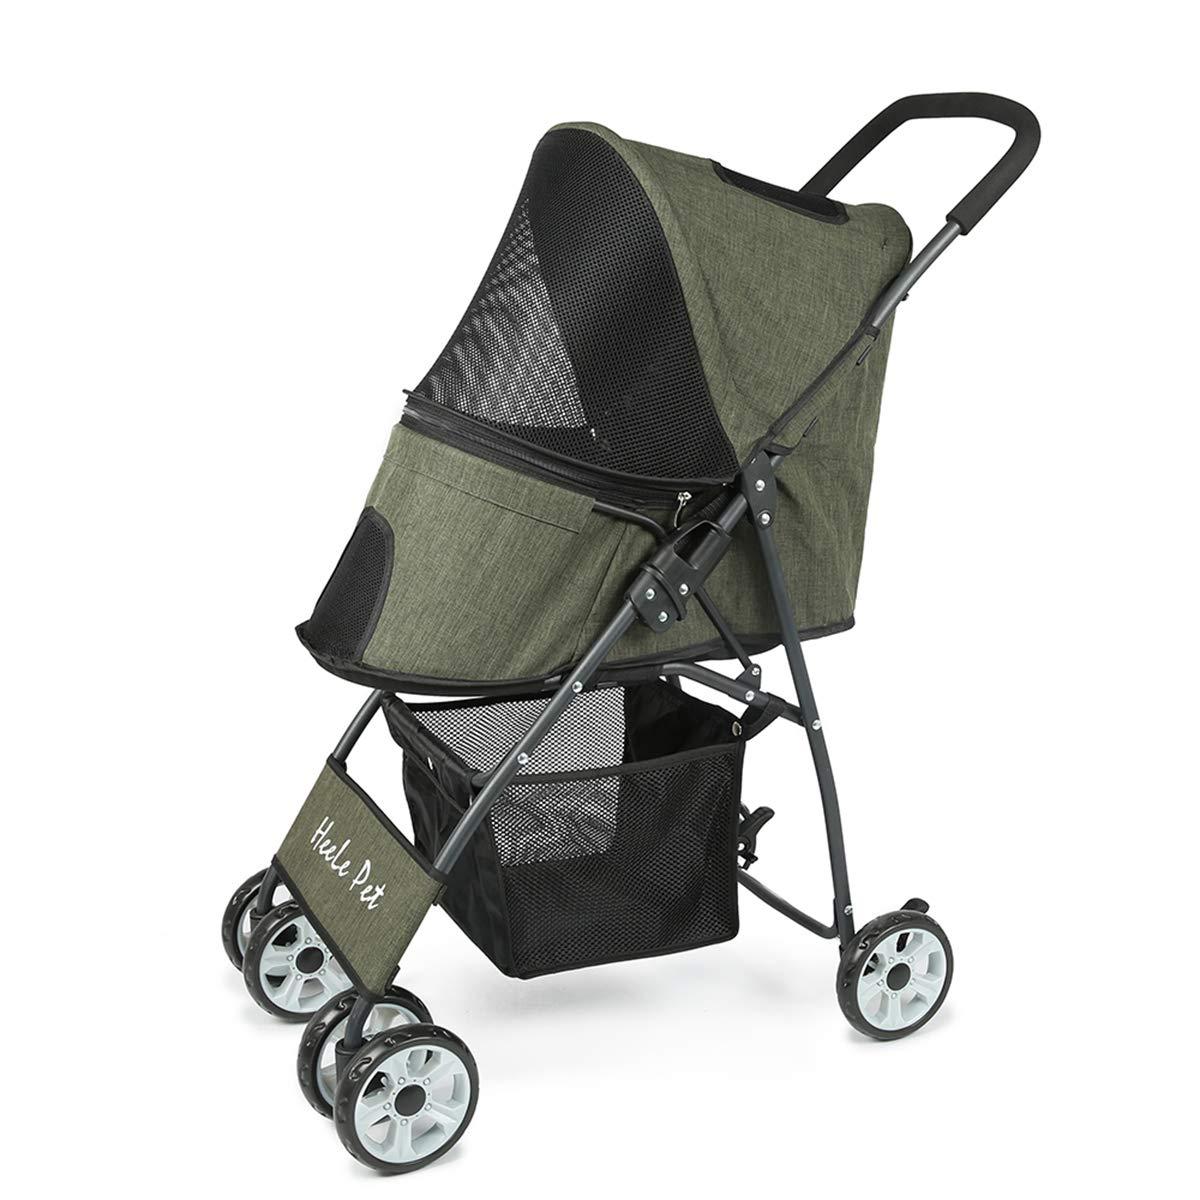 Pet Stroller Cat Dog Basket Zipper Entry Fold Cup Holder Carrier Cart Wheels Travel